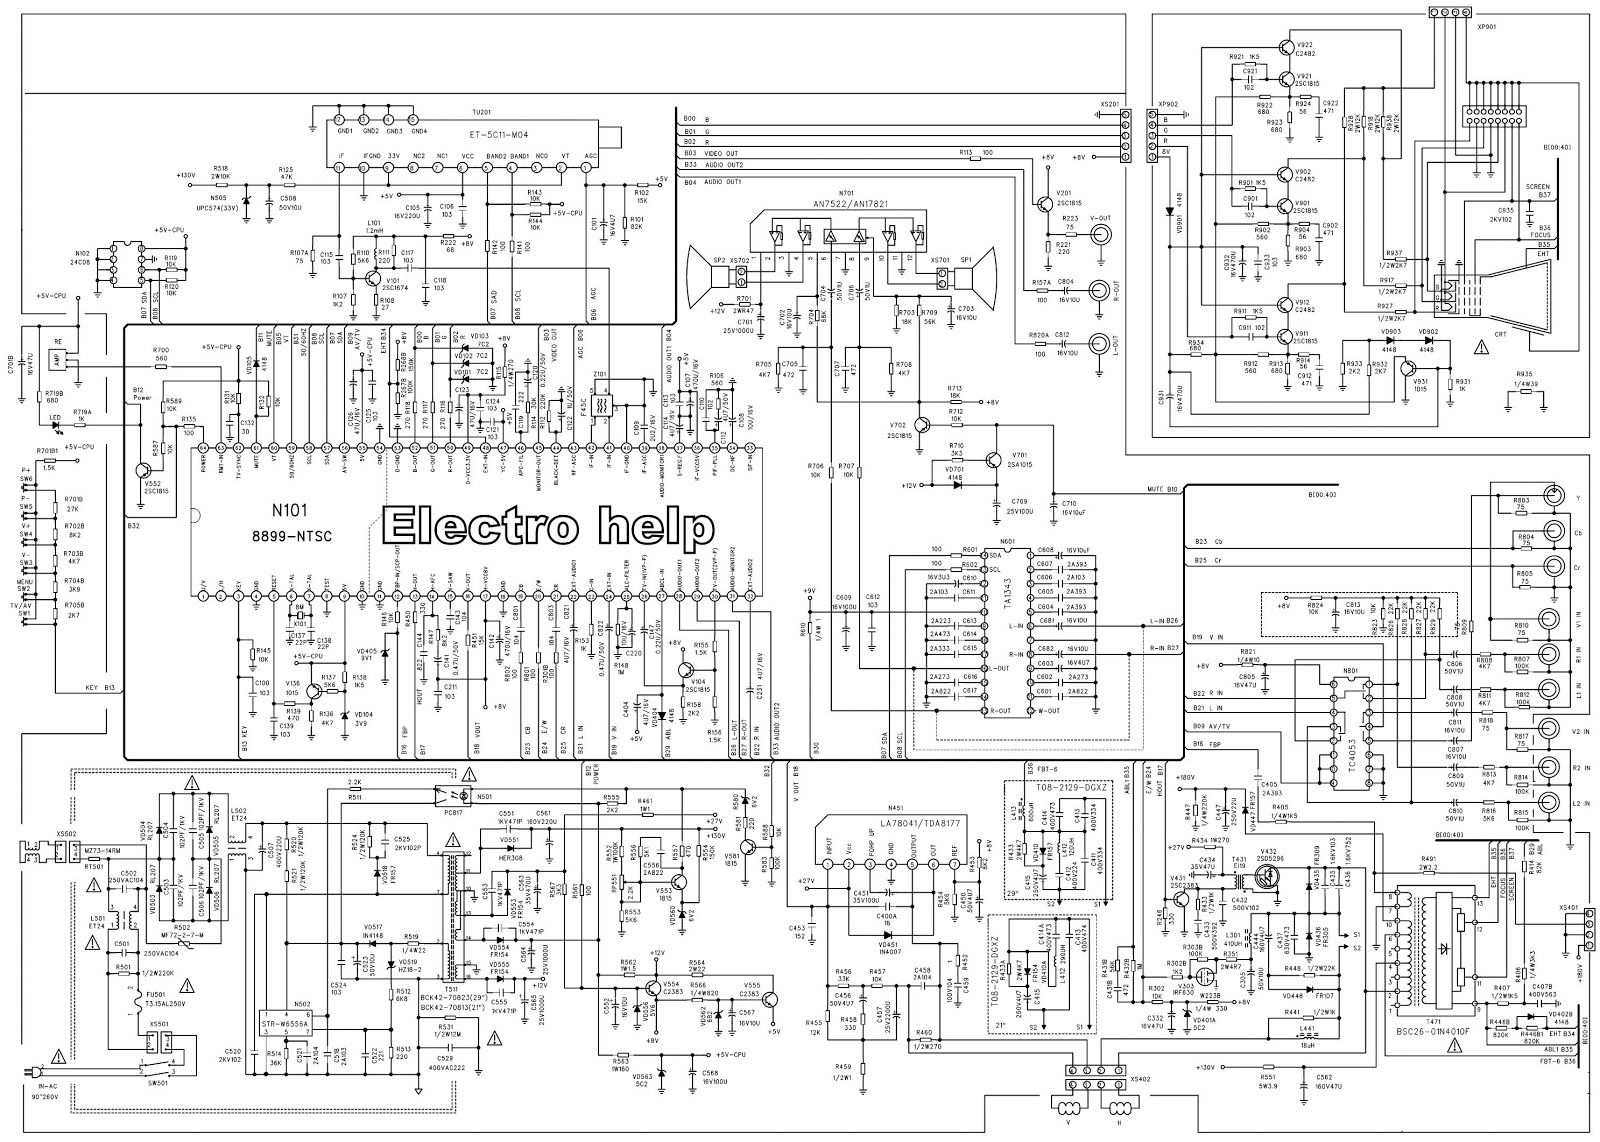 small resolution of sansui tv circuit diagram free download circuit diagram imagessansui tv circuit diagram free download circuit diagram